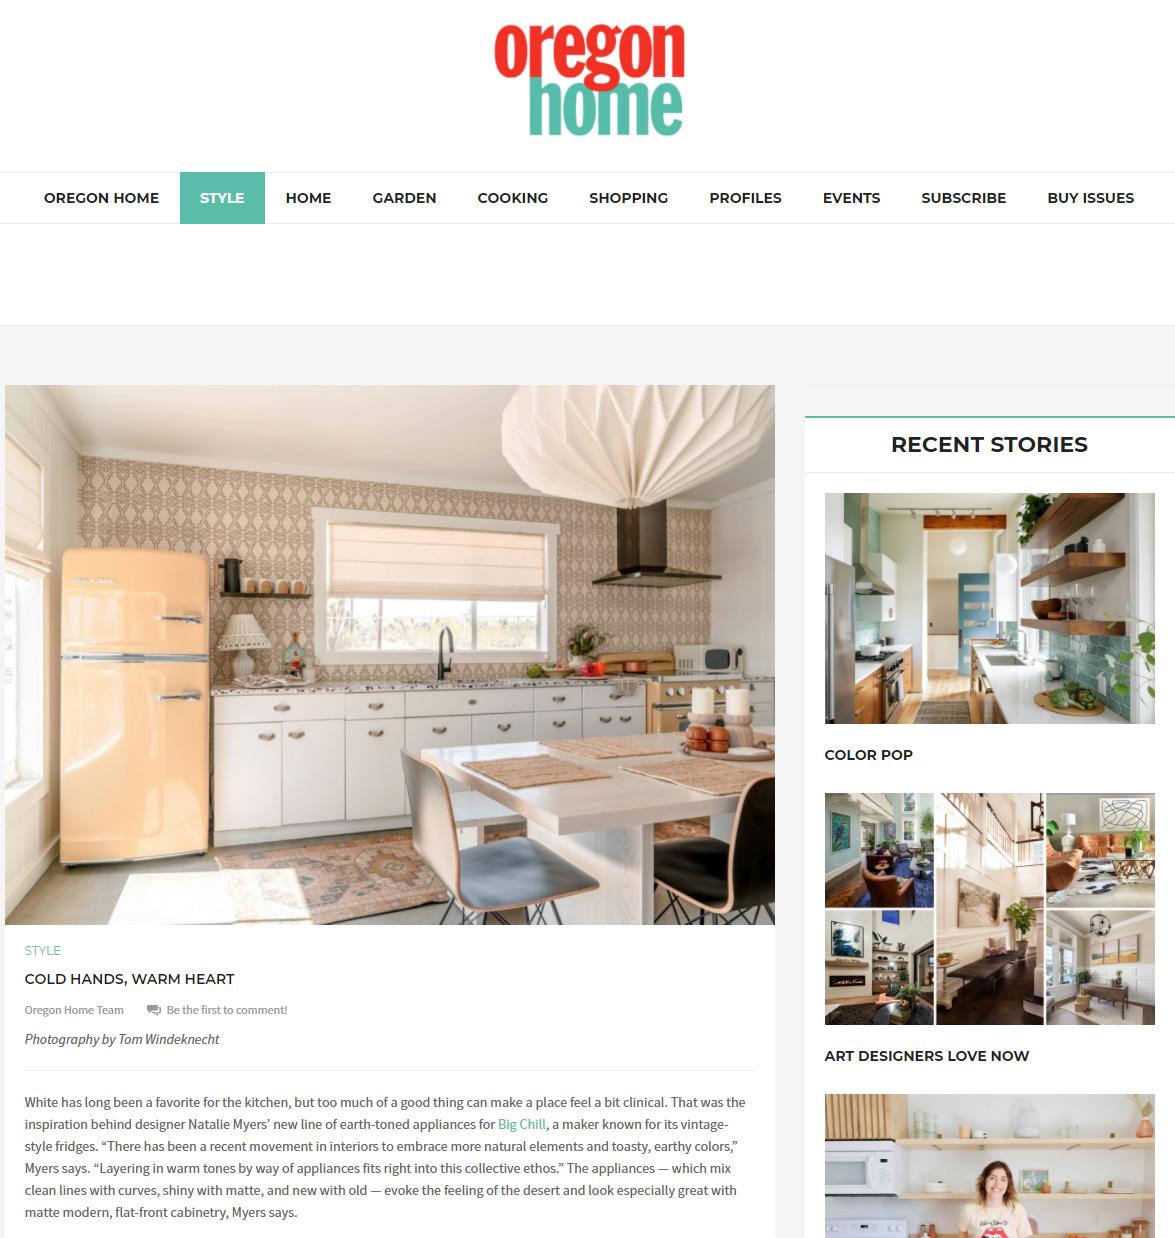 Oregon Home Online - April 5, 2021